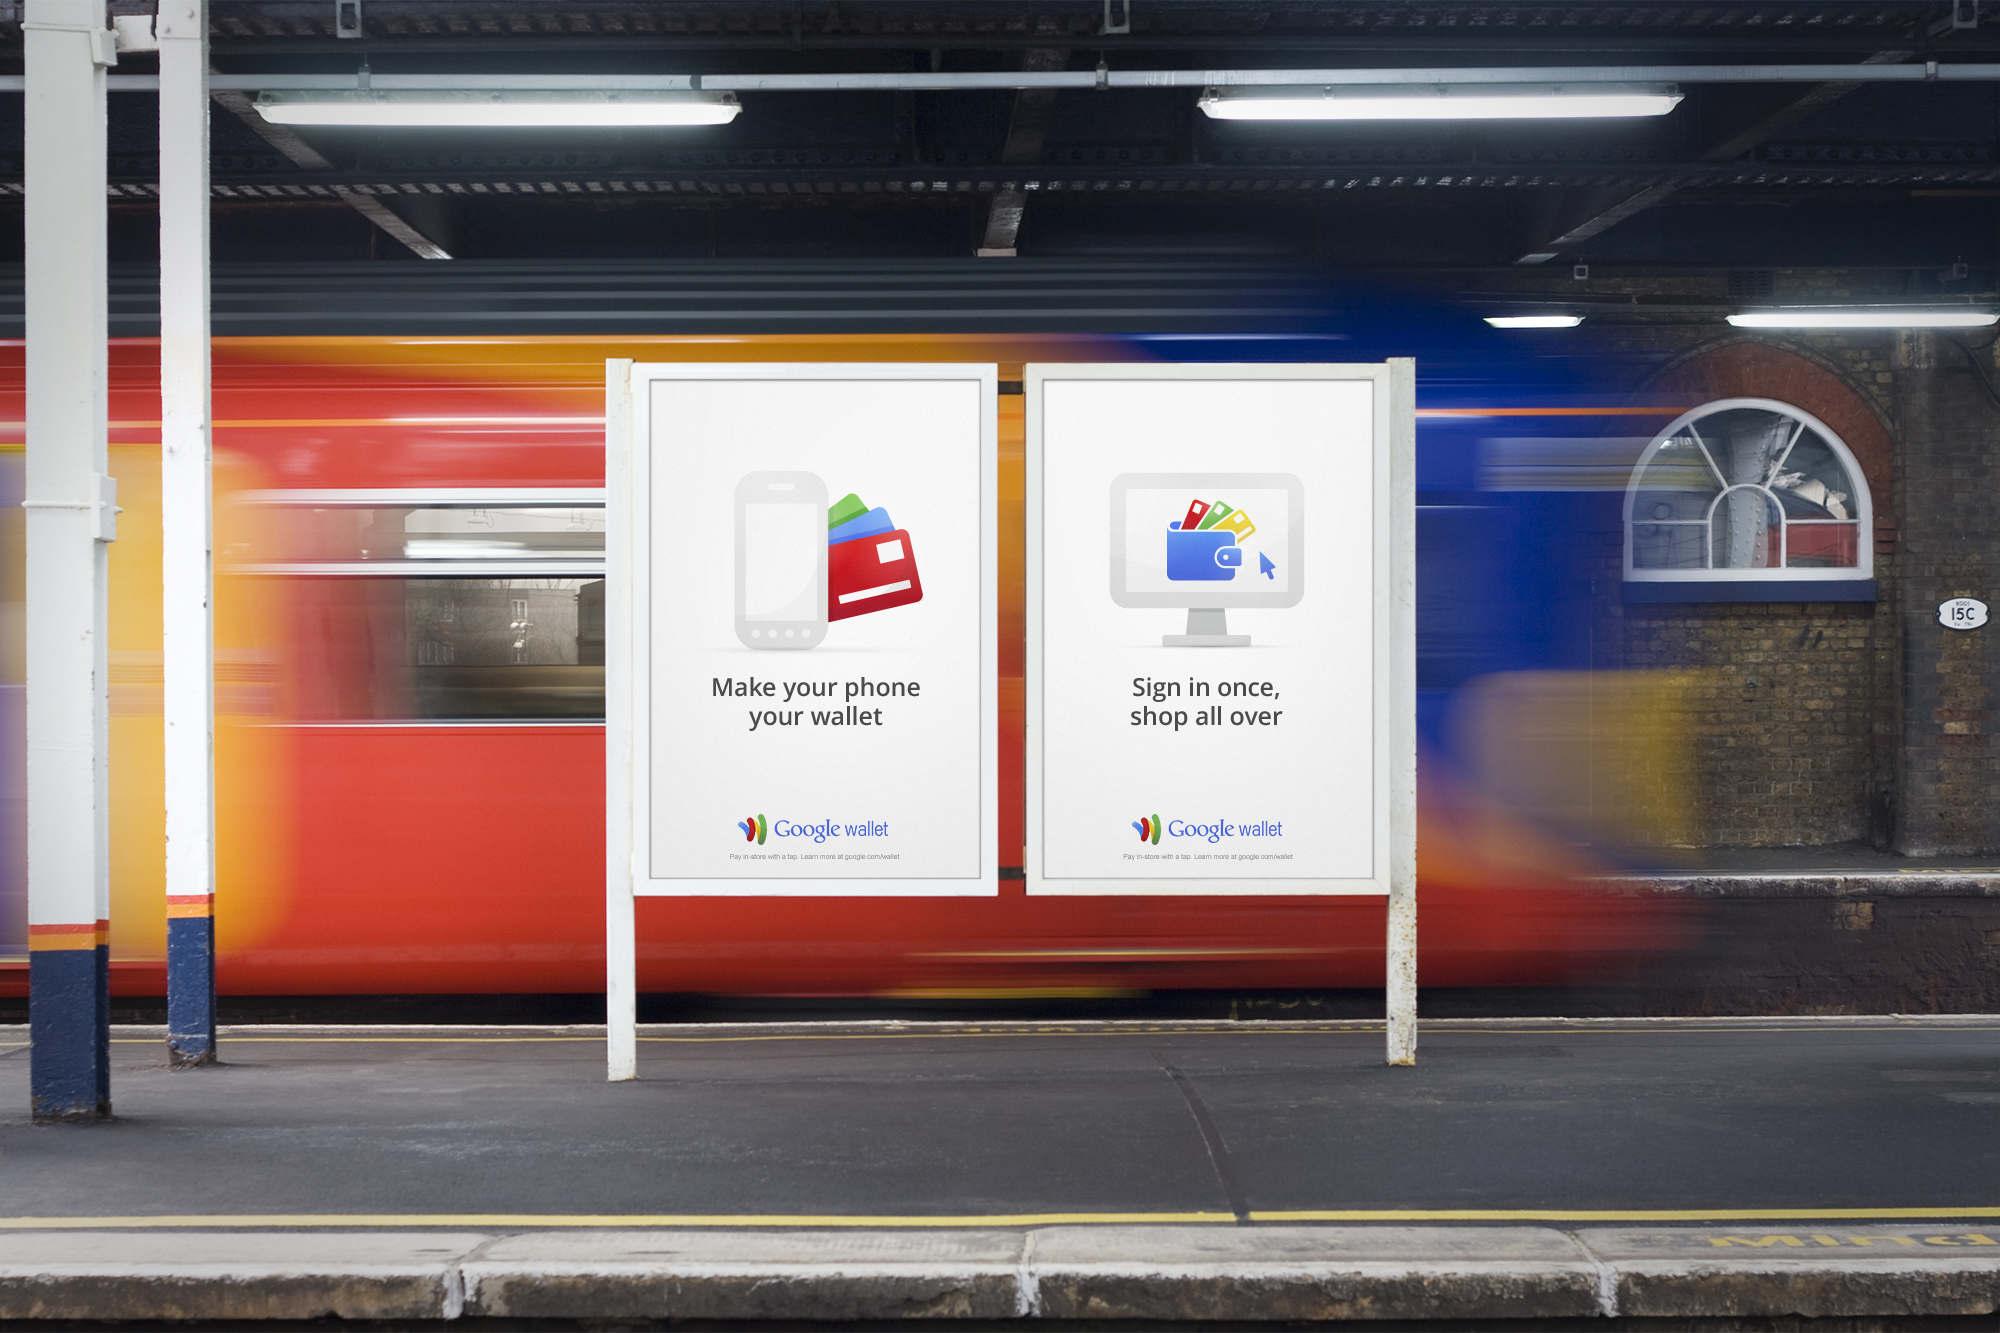 GW_Posters_Trainstation_1_2000px_2000_c.jpg